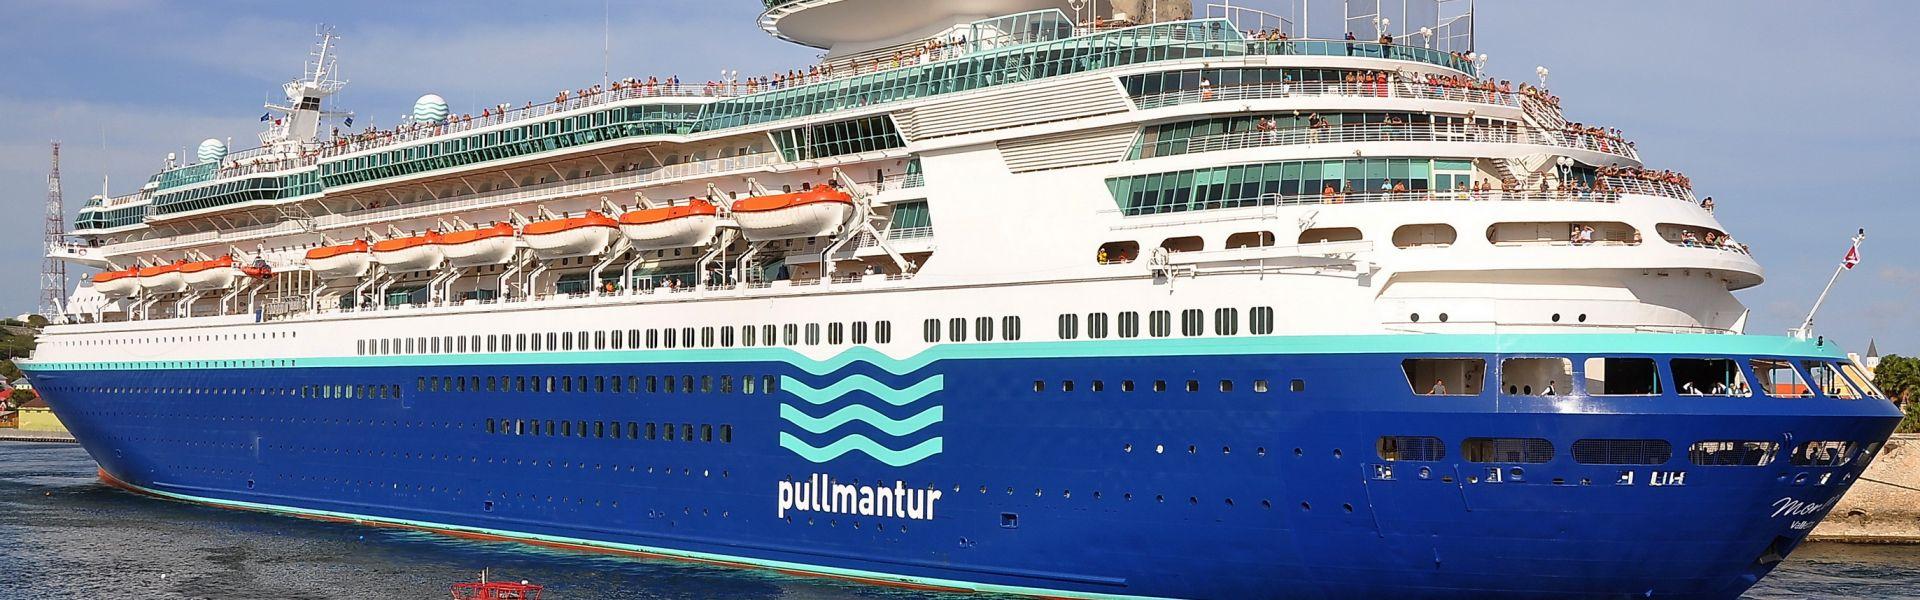 Croaziera 2017 - Caraibele de Vest (Colon) - Pullmantur Cruises - Monarch 7 nopti